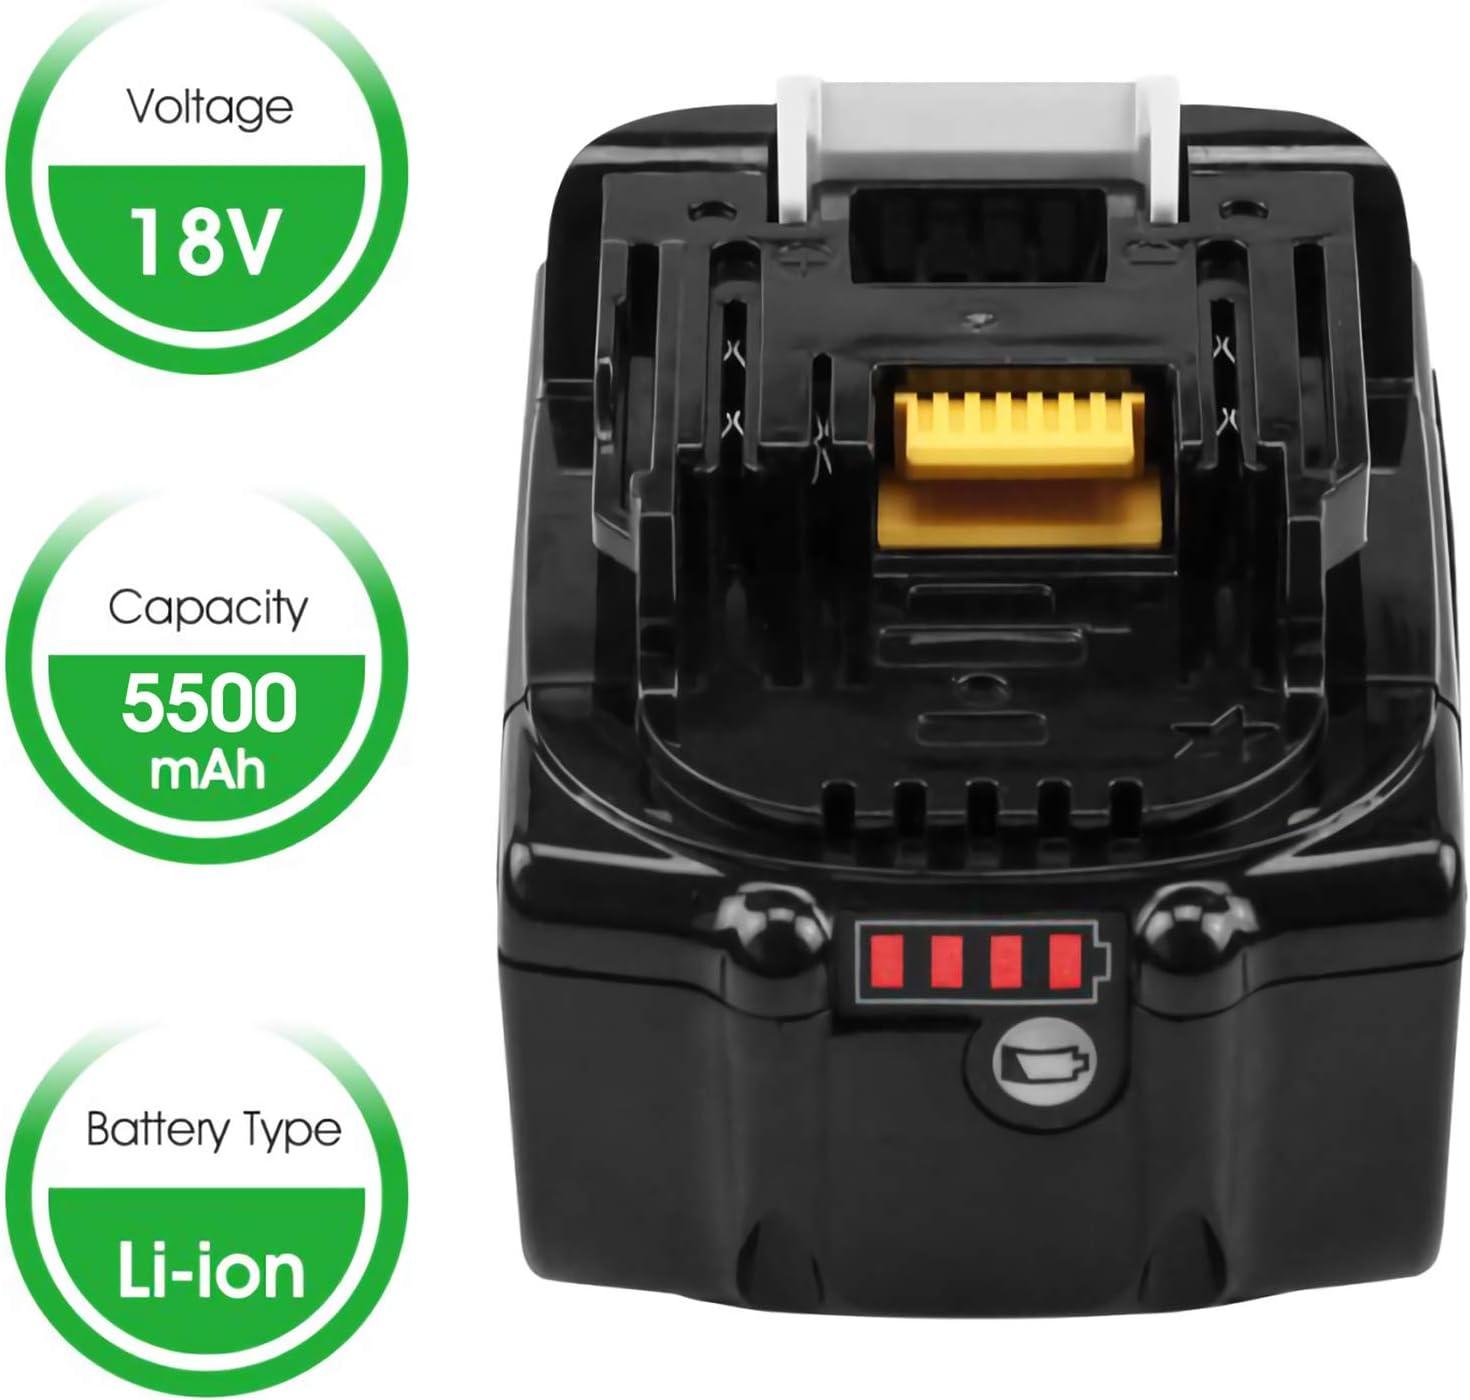 Hochstern BL1860B remplacement pour batterie Makita 18 V BL1860 BL1850B BL1850 BL1840B BL1840 BL1830B BL1830 BL1820 LXT-400 avec indicateurs LED